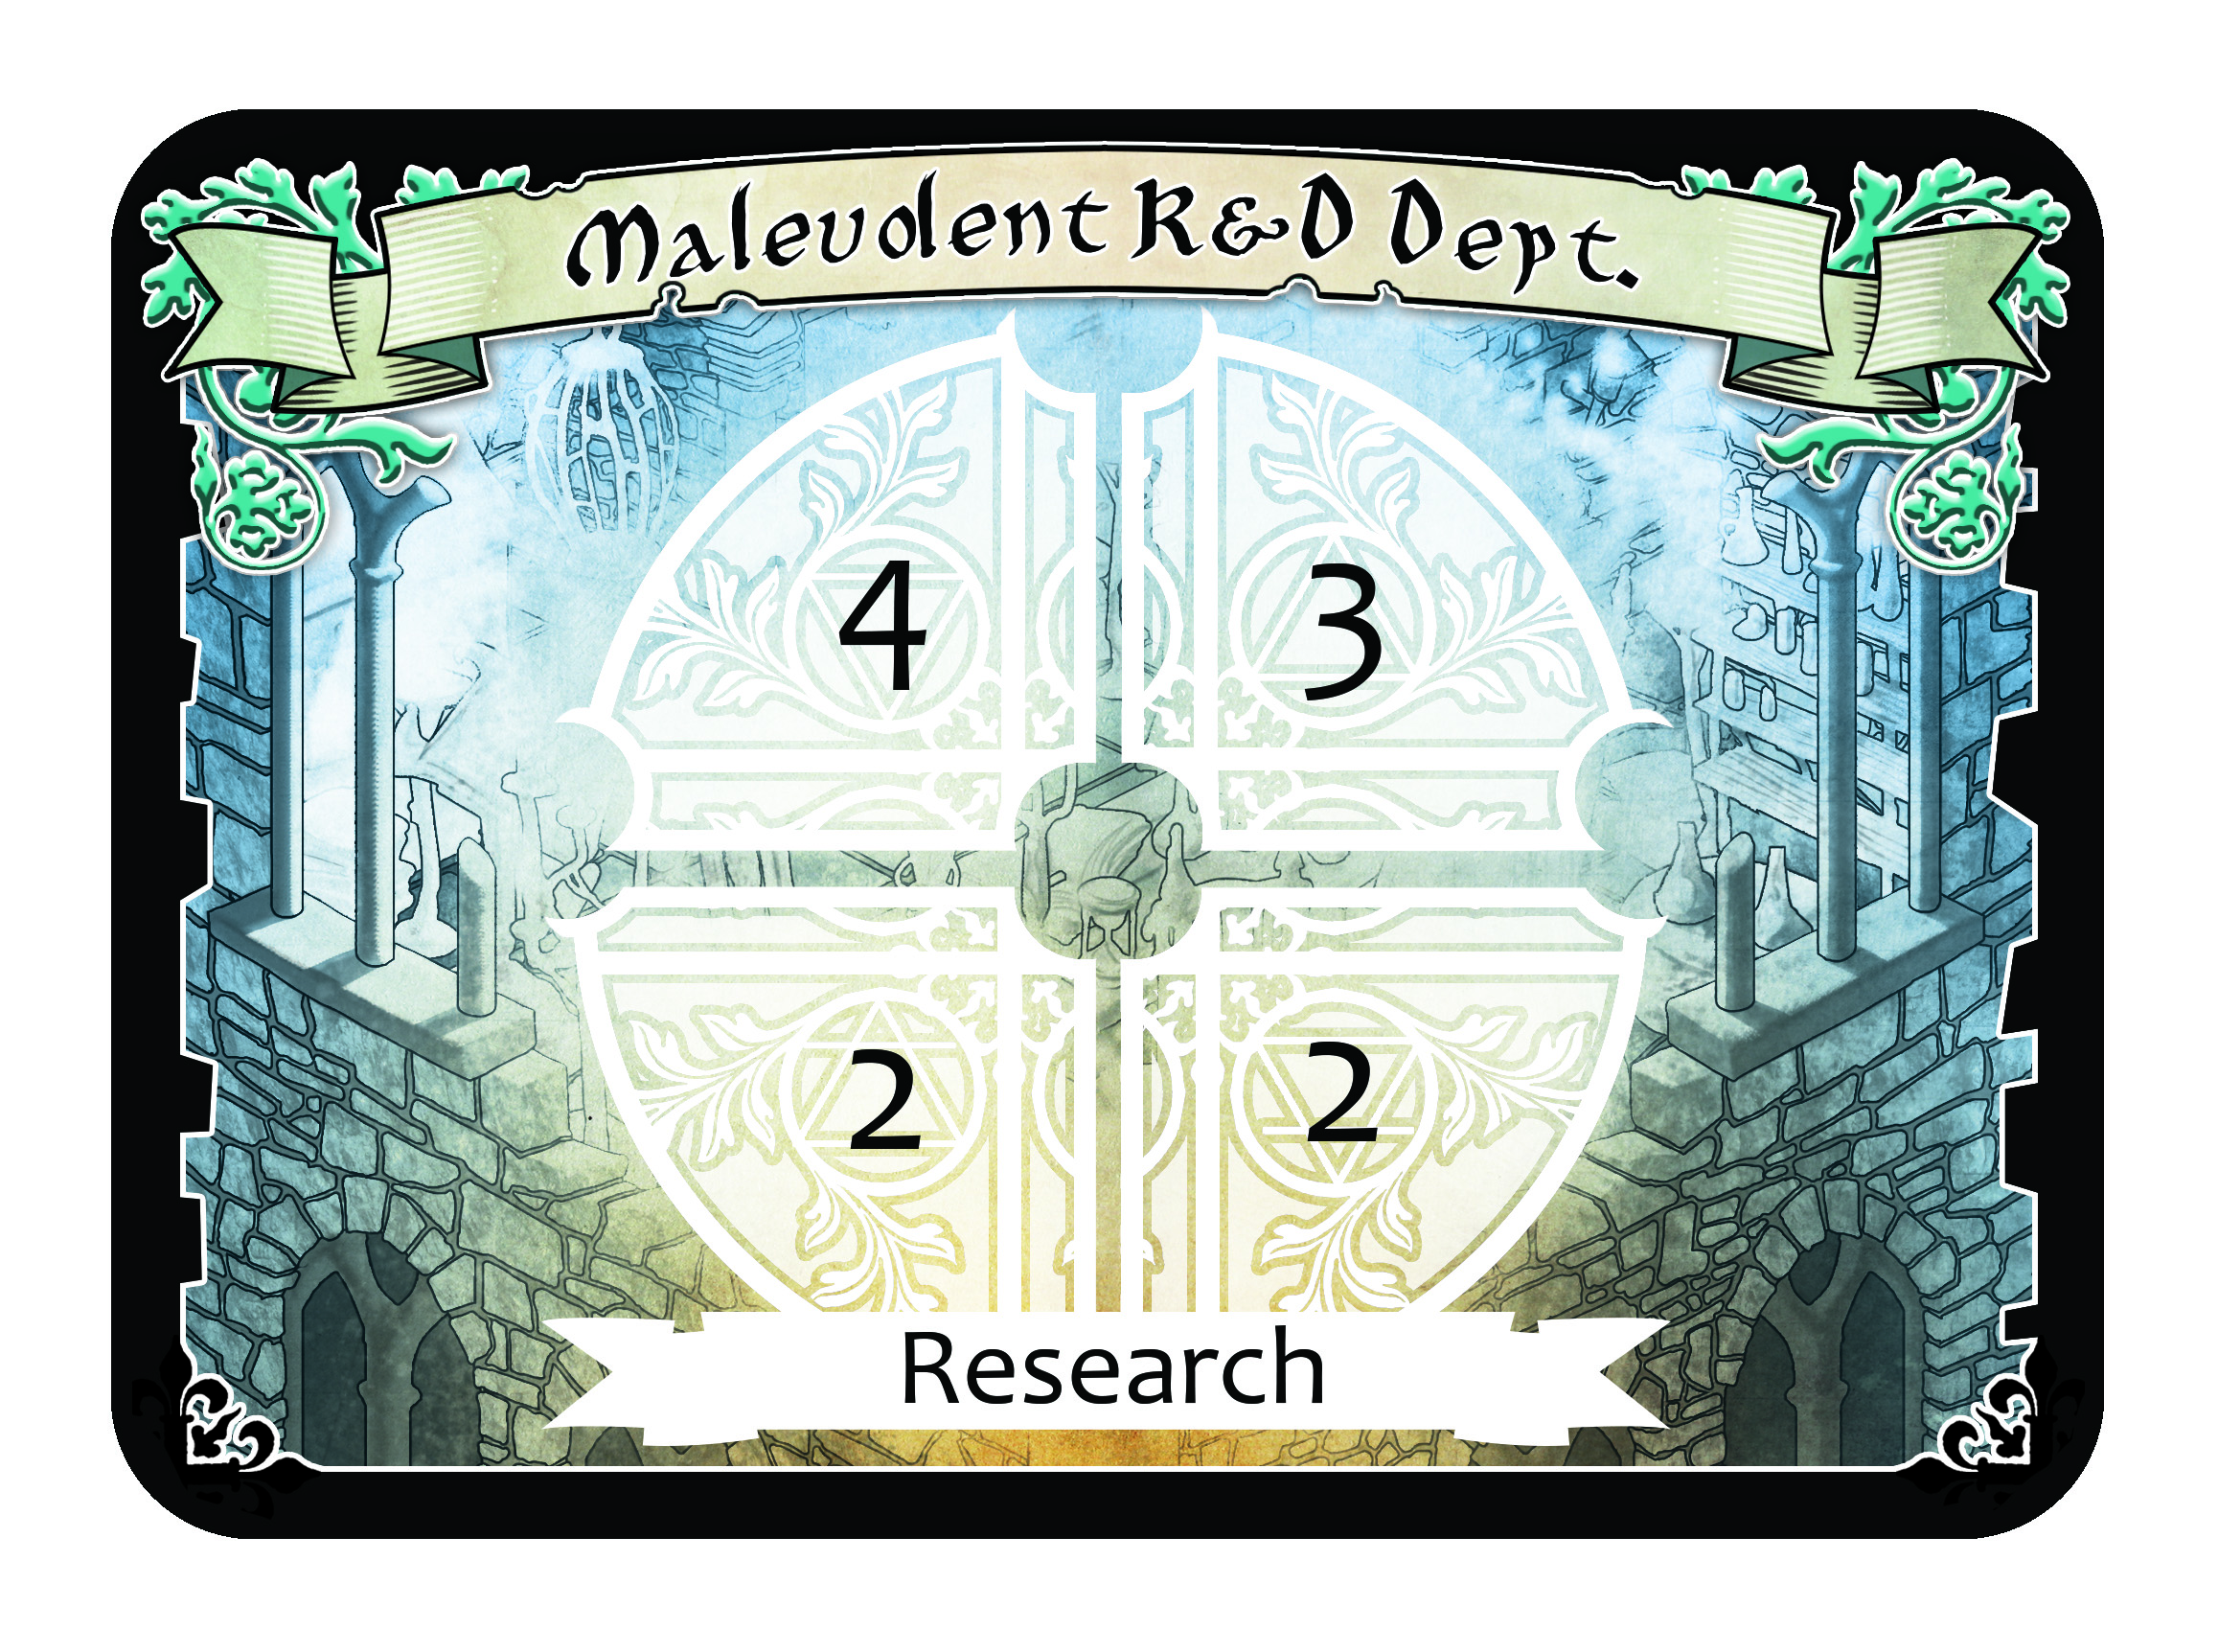 CORE - Malevolent R&D Dept